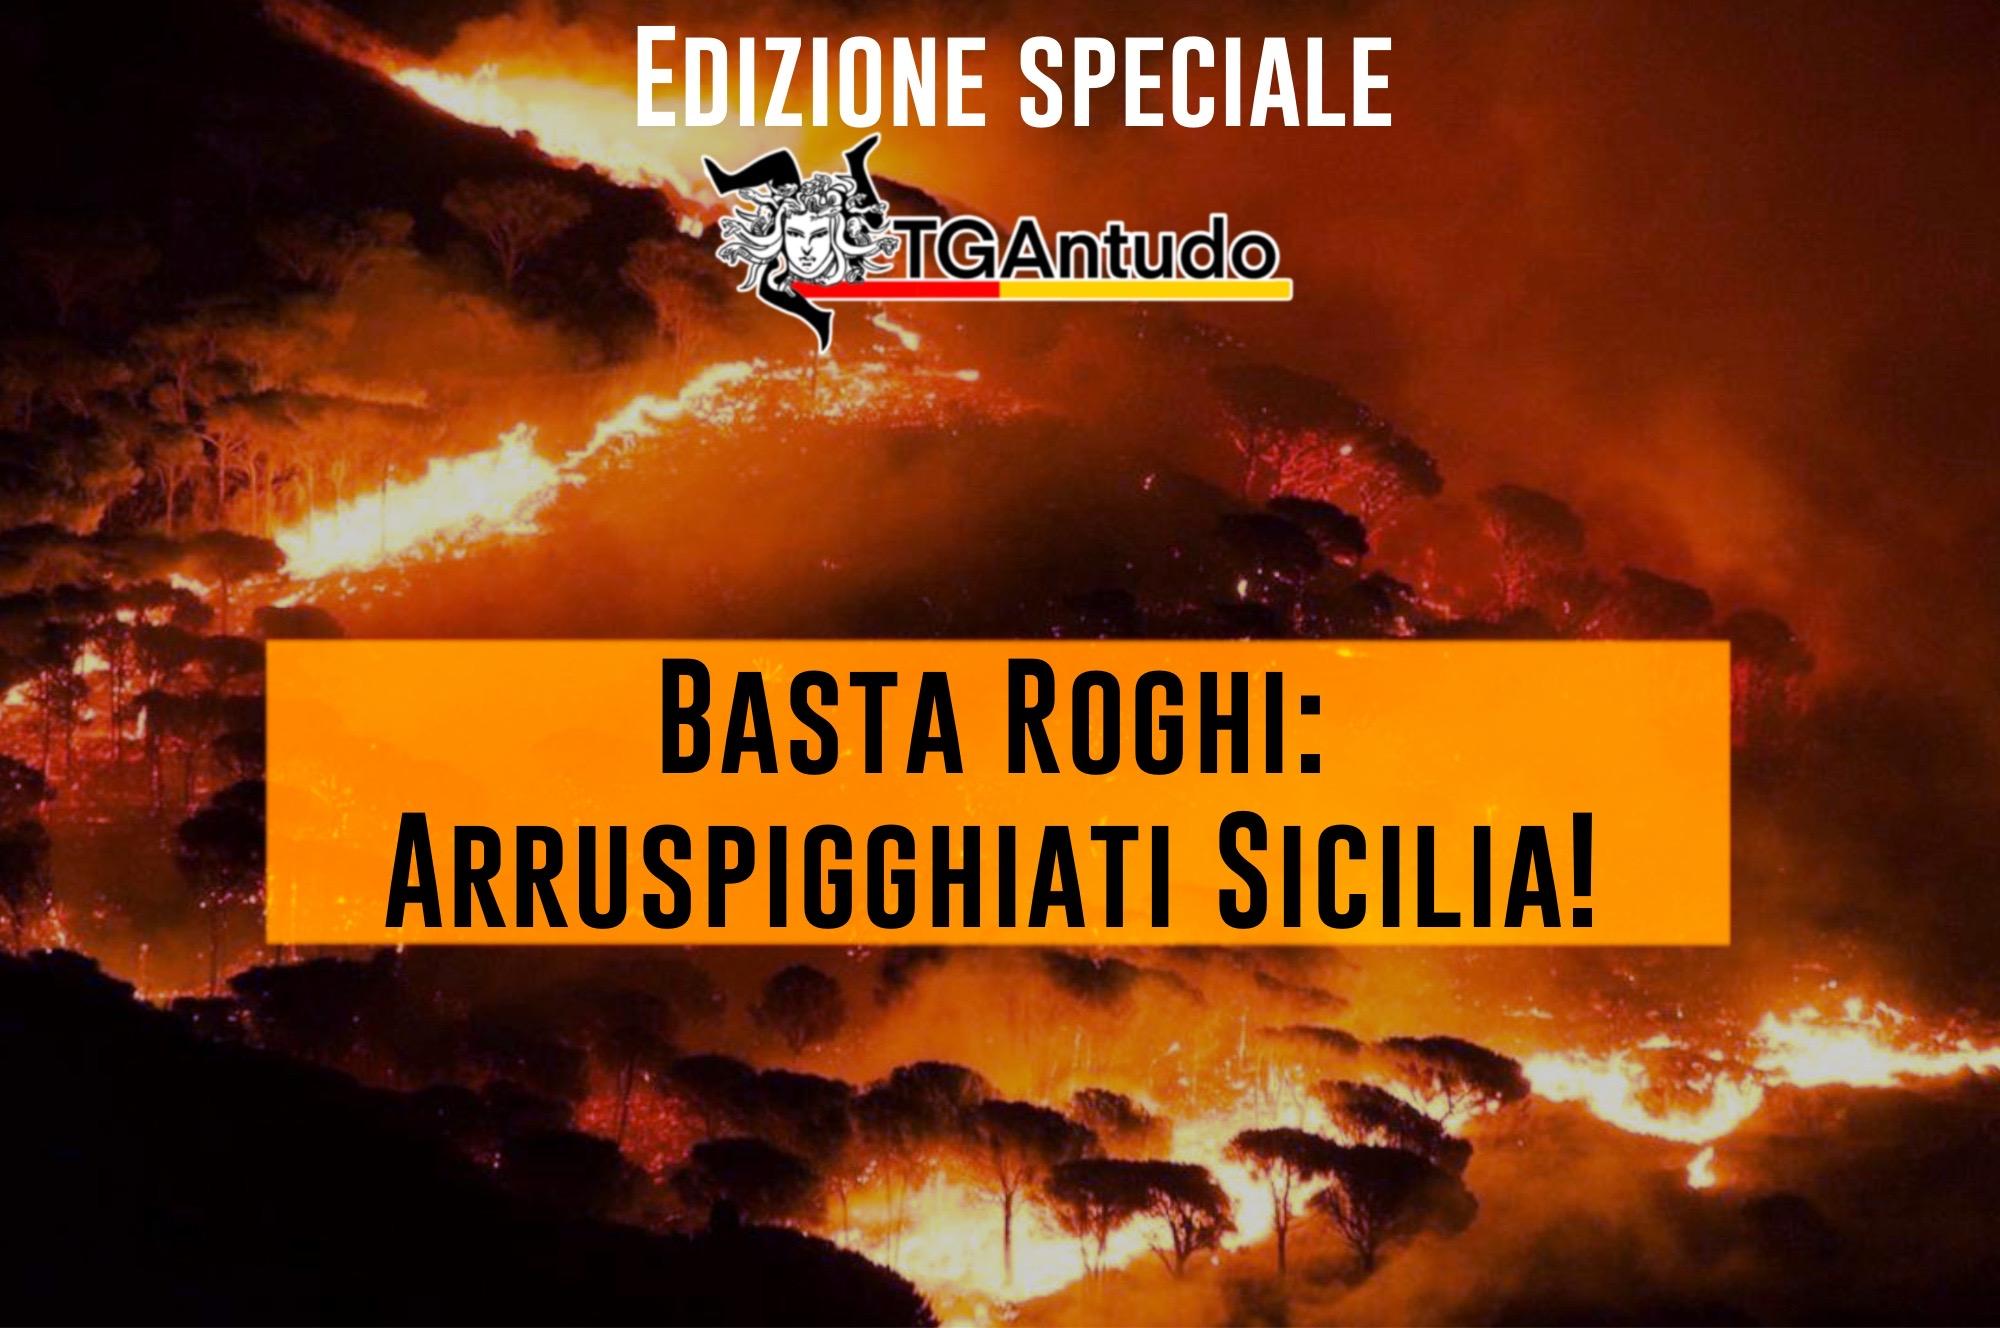 TGAntudo  – Basta roghi: arruspigghiati Sicilia!